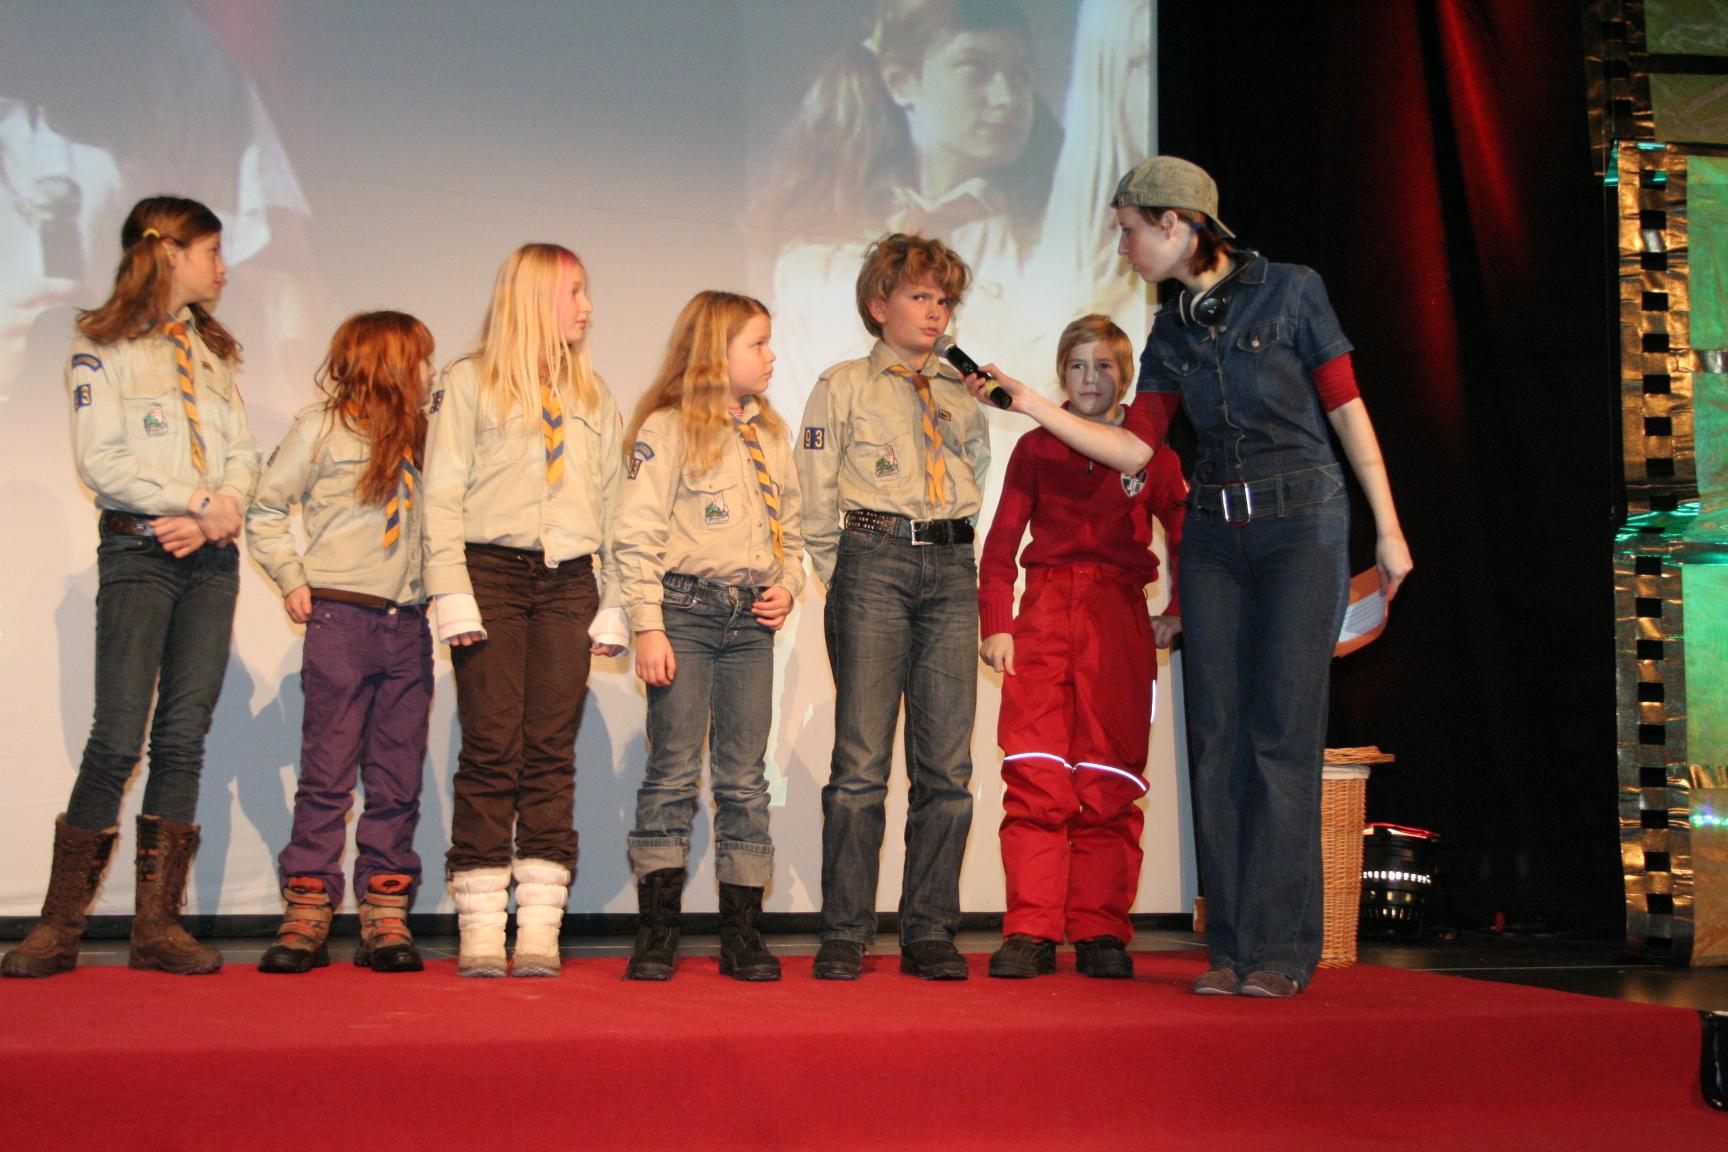 6. MiKiFiFe 2010: Impressionen (8)